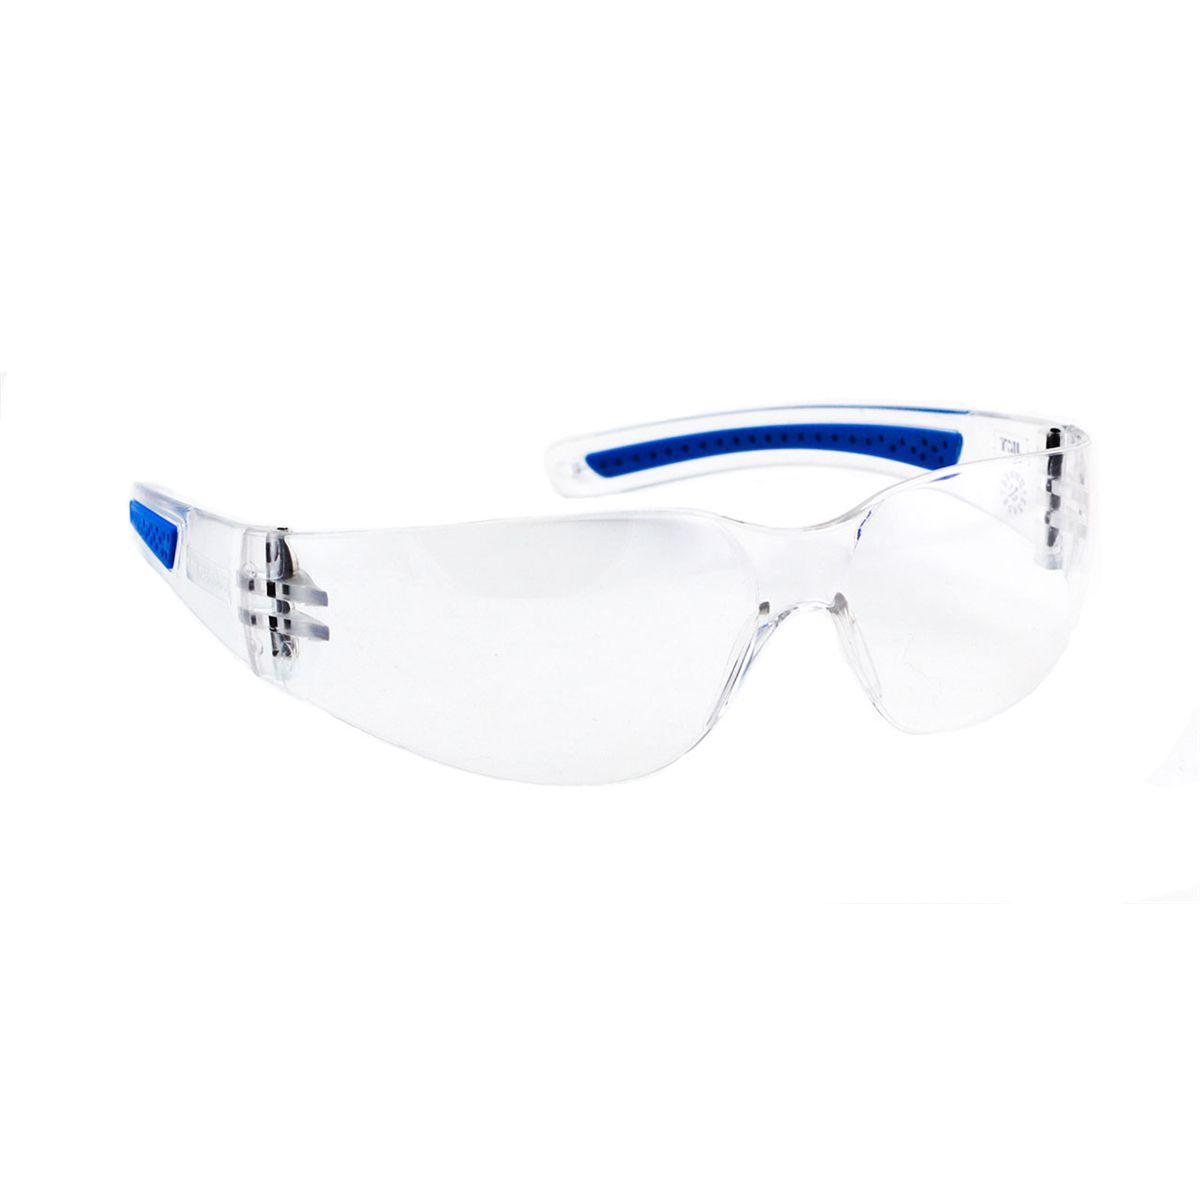 Óculos Leopardo Incolor New Stylus Plus ValePlast - 10 Unid.